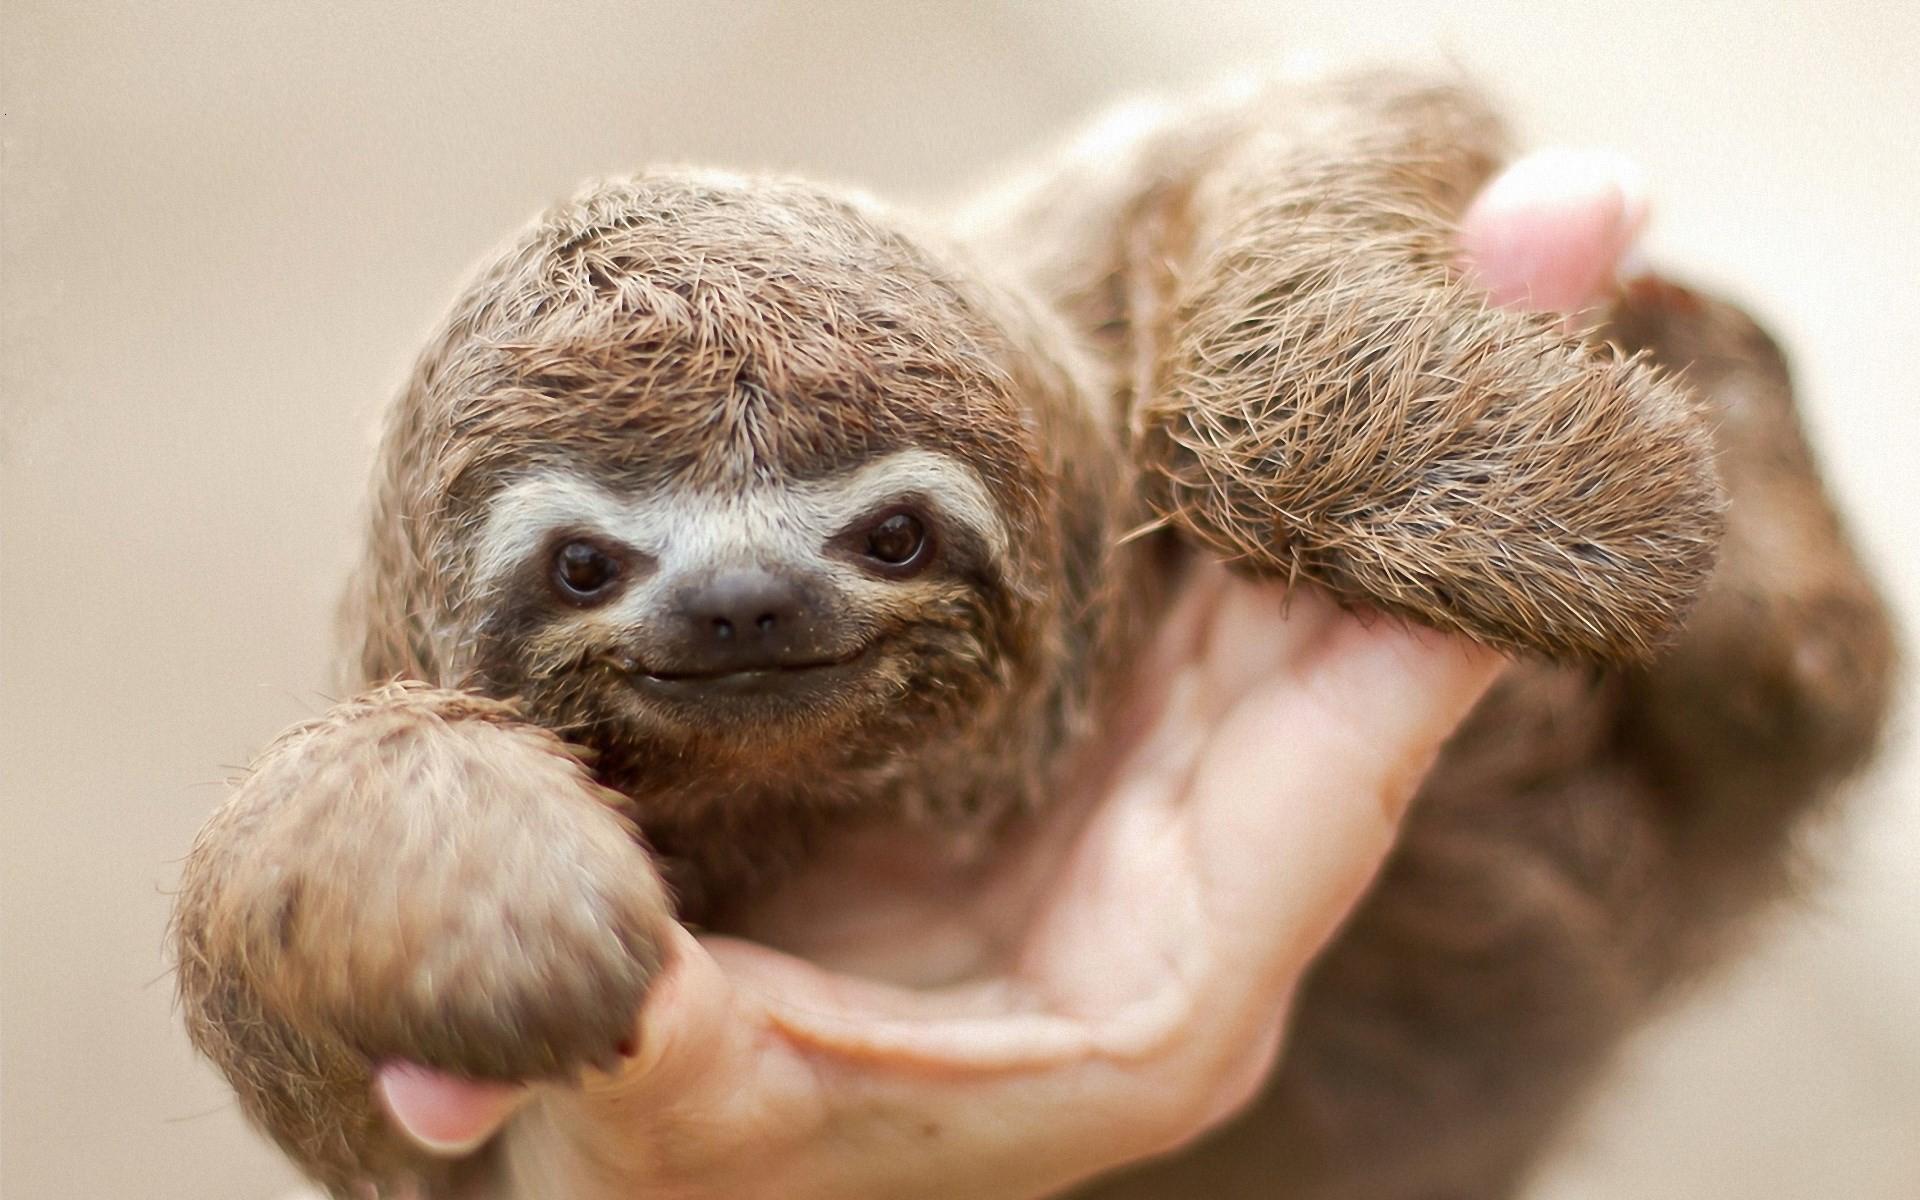 Sloth · sloth wallpaper download free